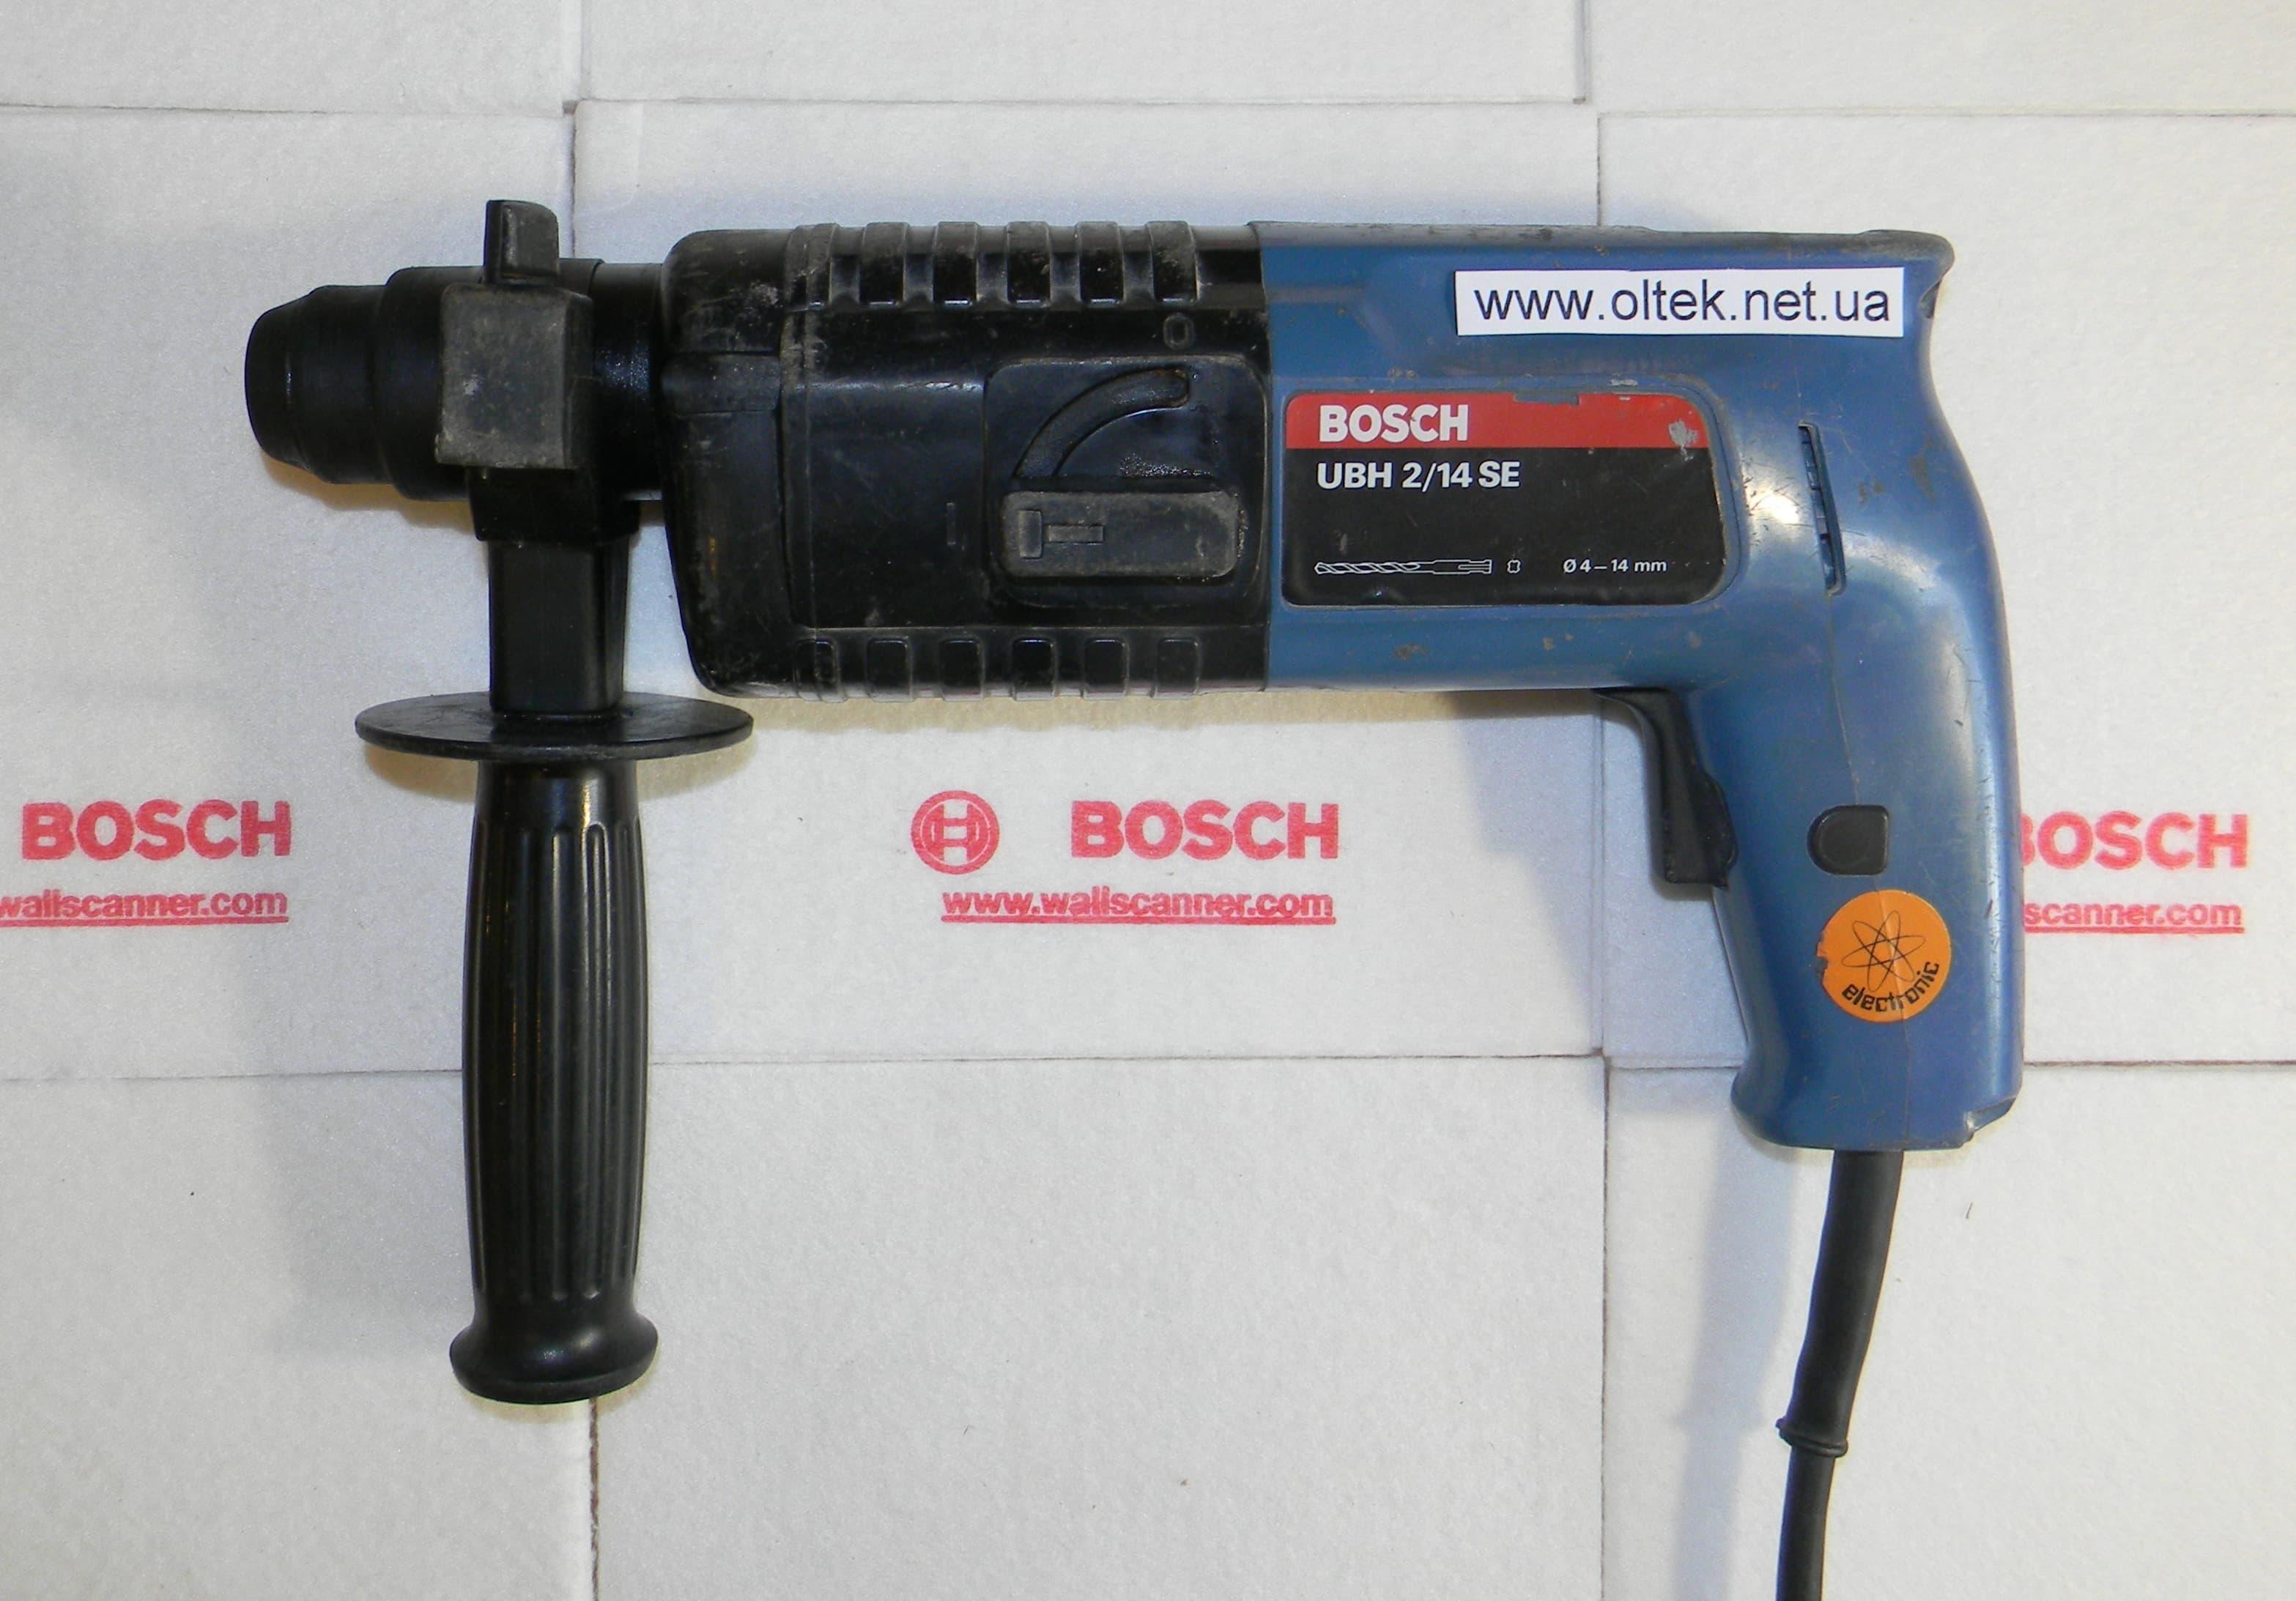 bosch-UBH-2-14-SE